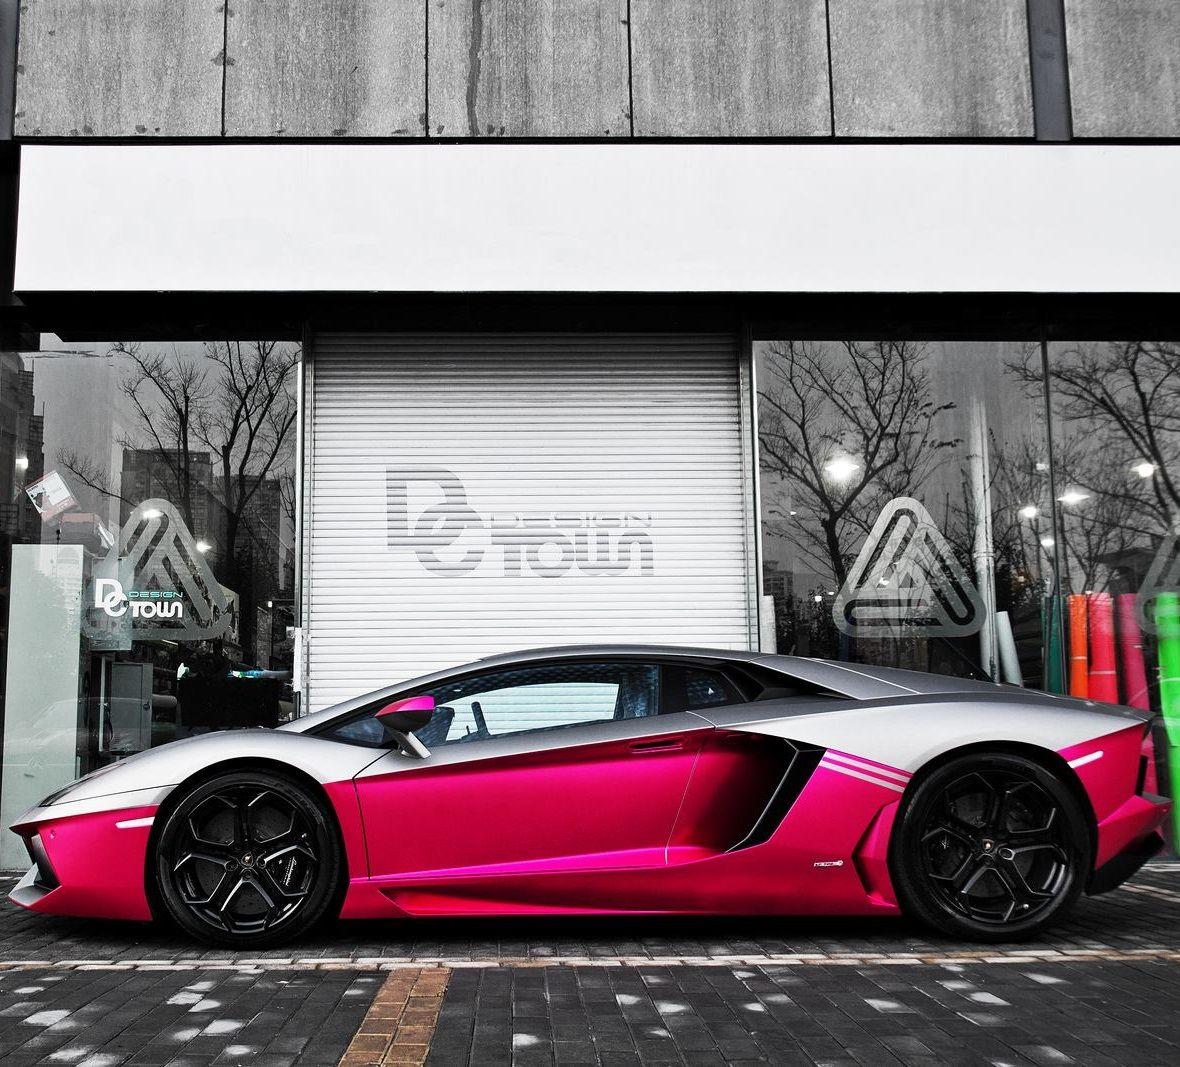 Twotone pink and silver Aventador CarFlash Dream